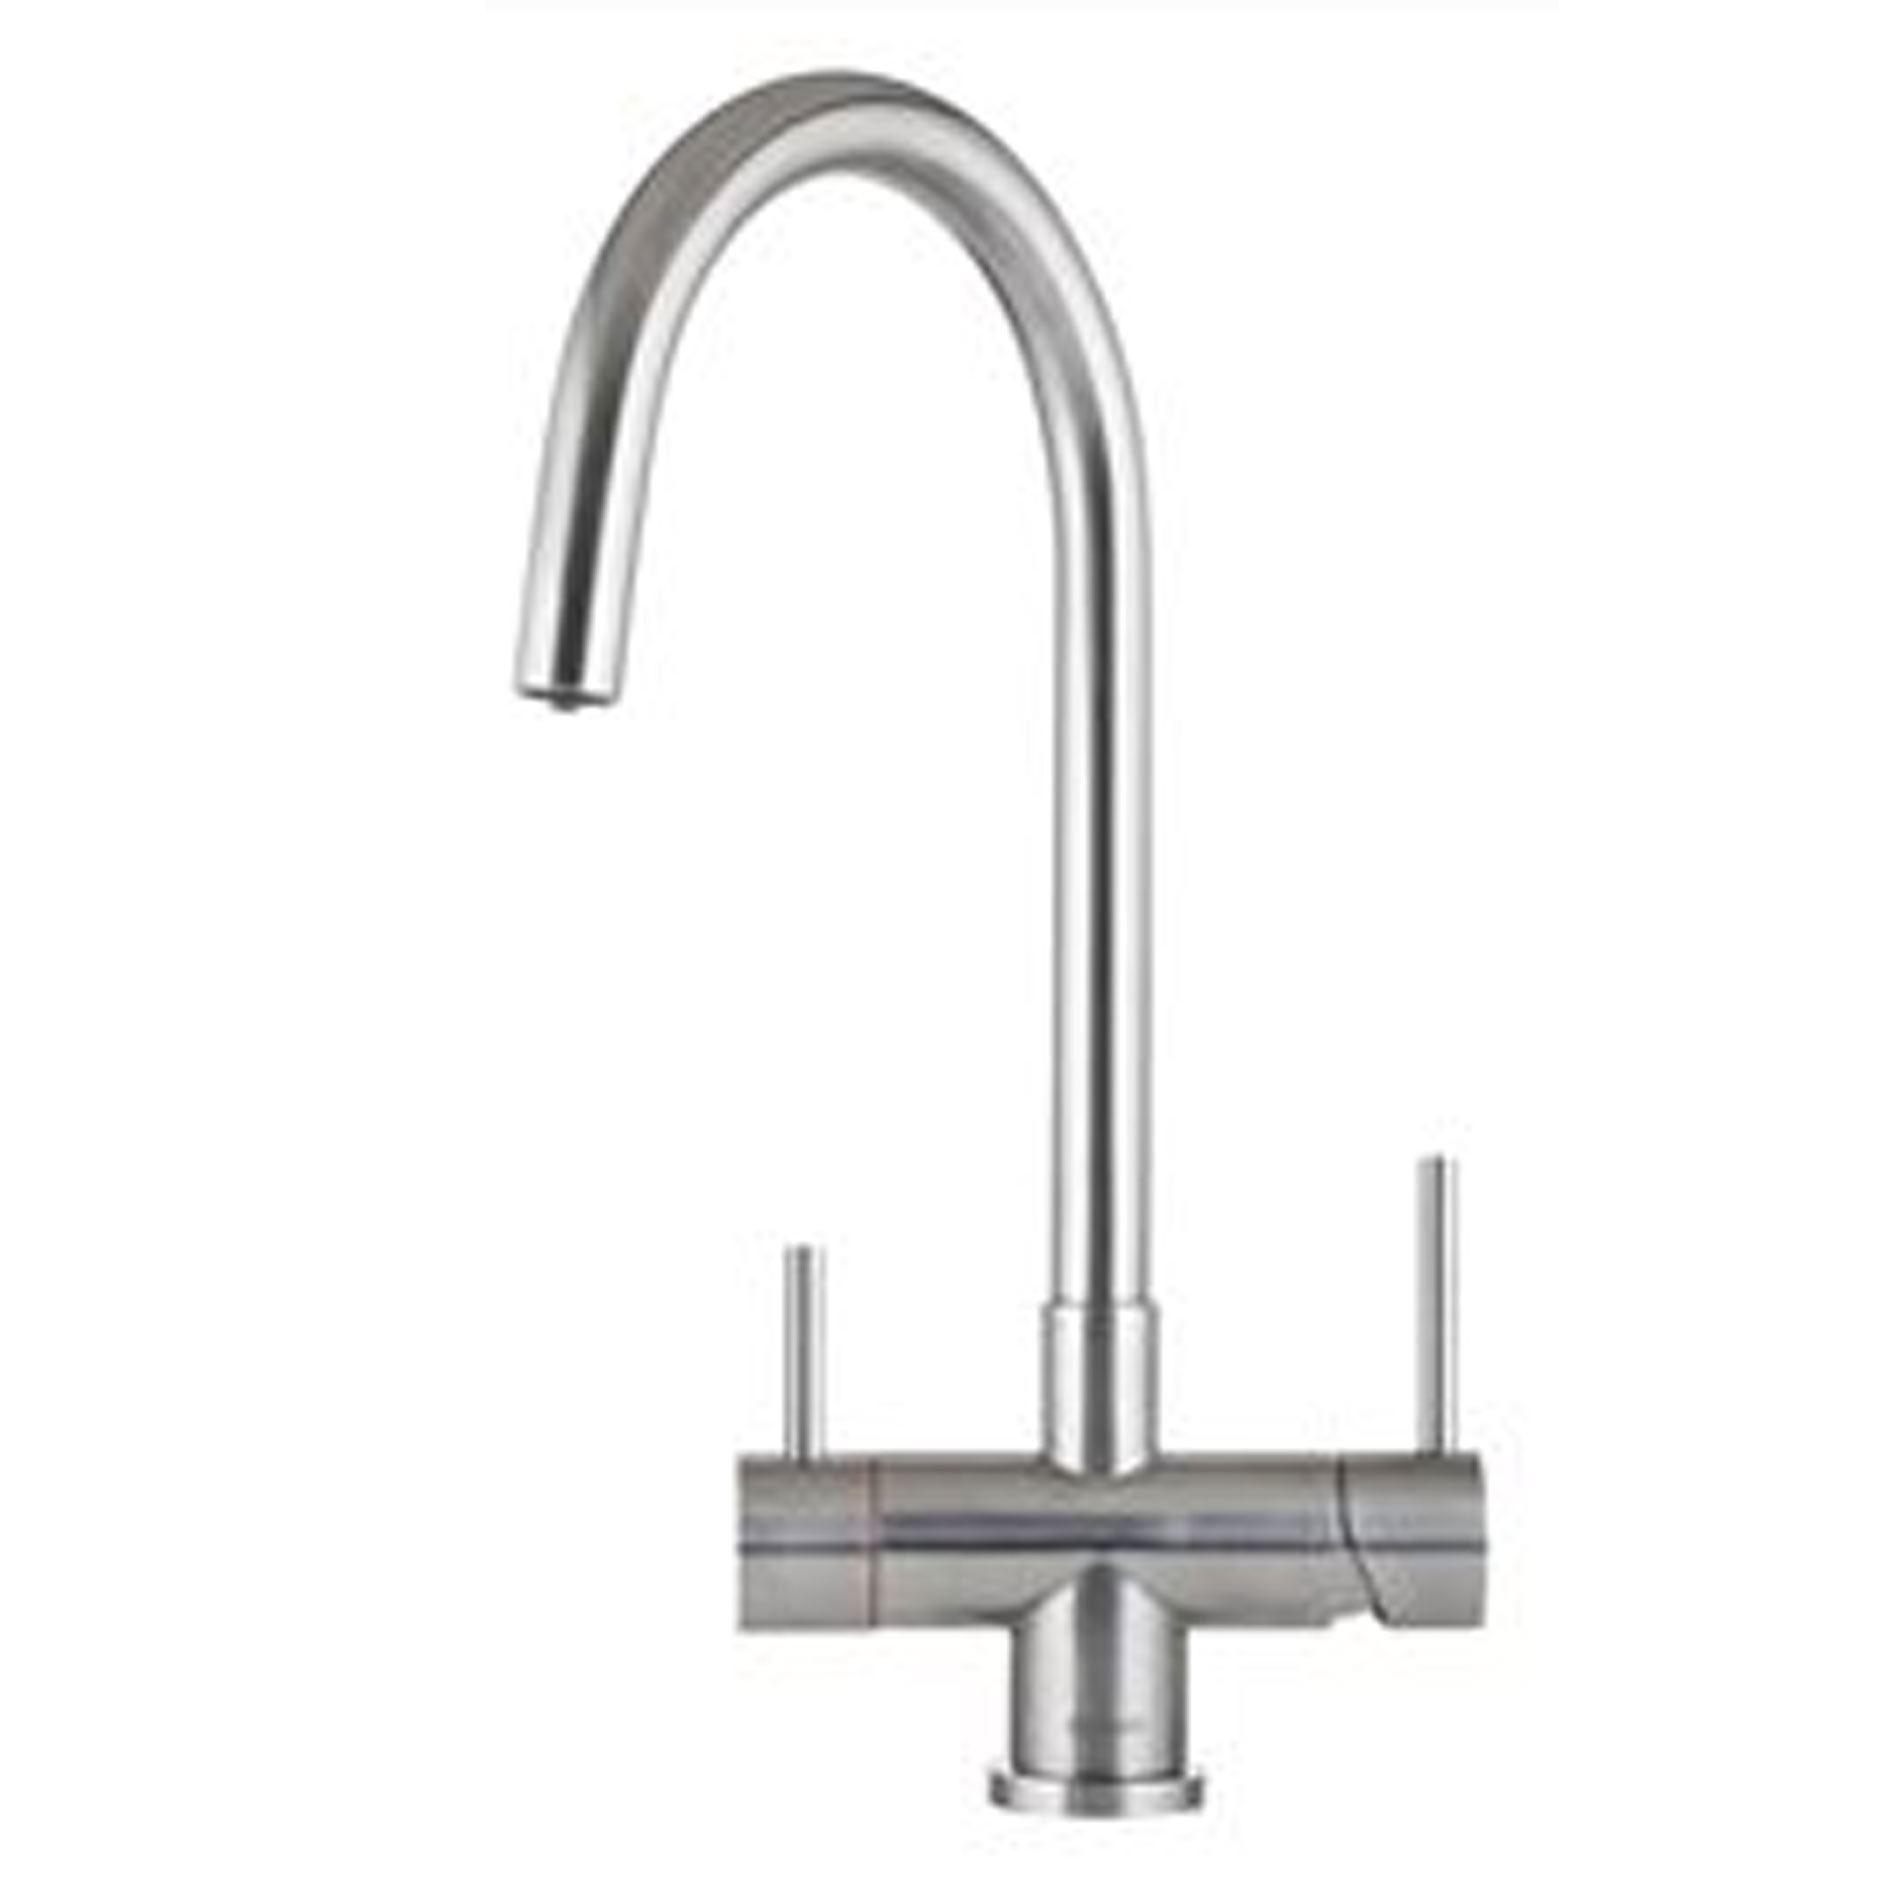 caple vapos 3 in 1 steaming hot water tap kitchen sinks taps